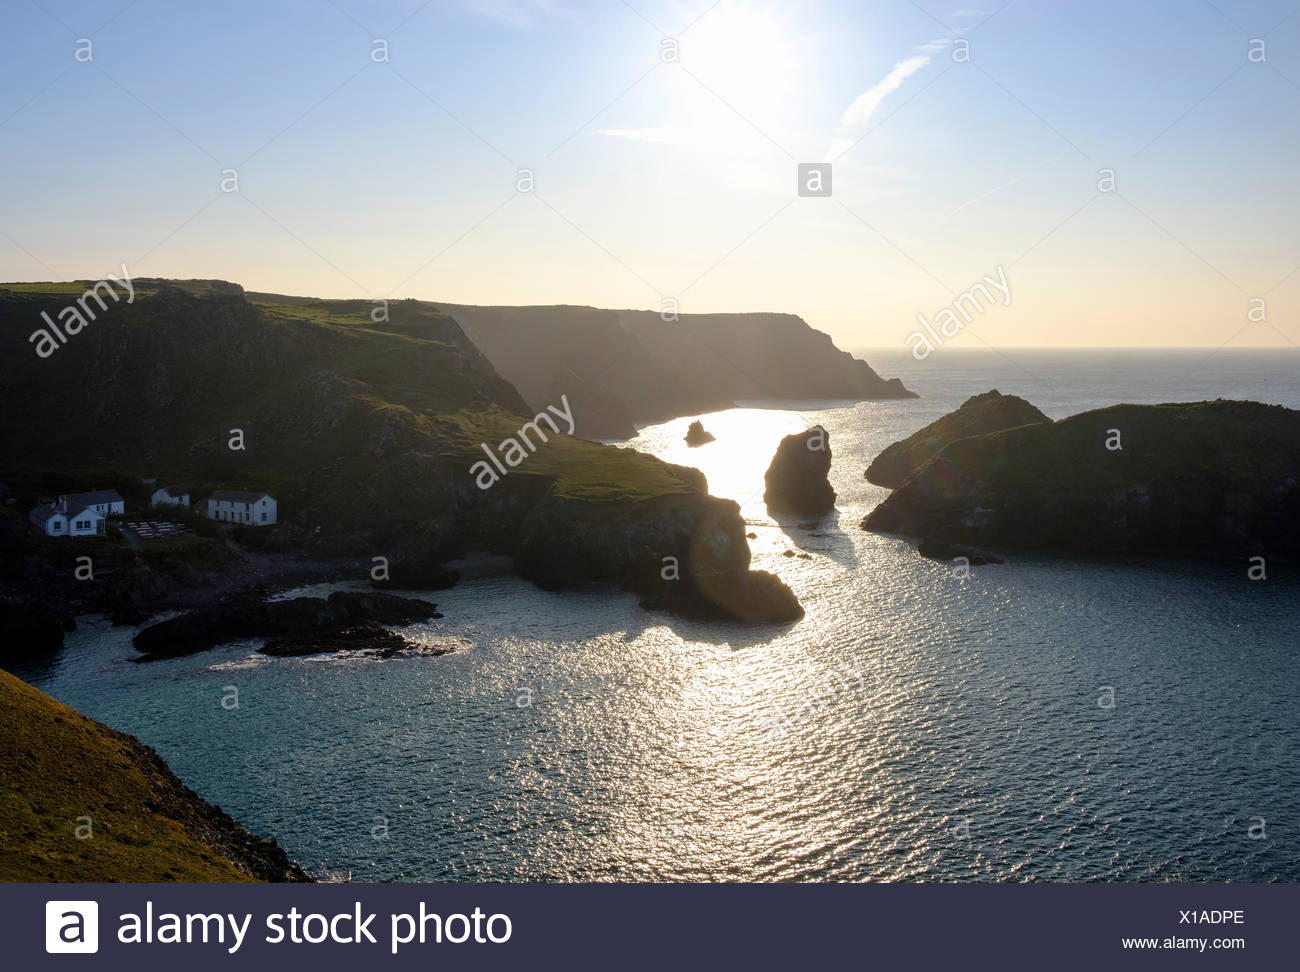 Abendstimmung, Kynance Cove, Lizard-Halbinsel, Cornwall, England, Großbritannien - Stock Image